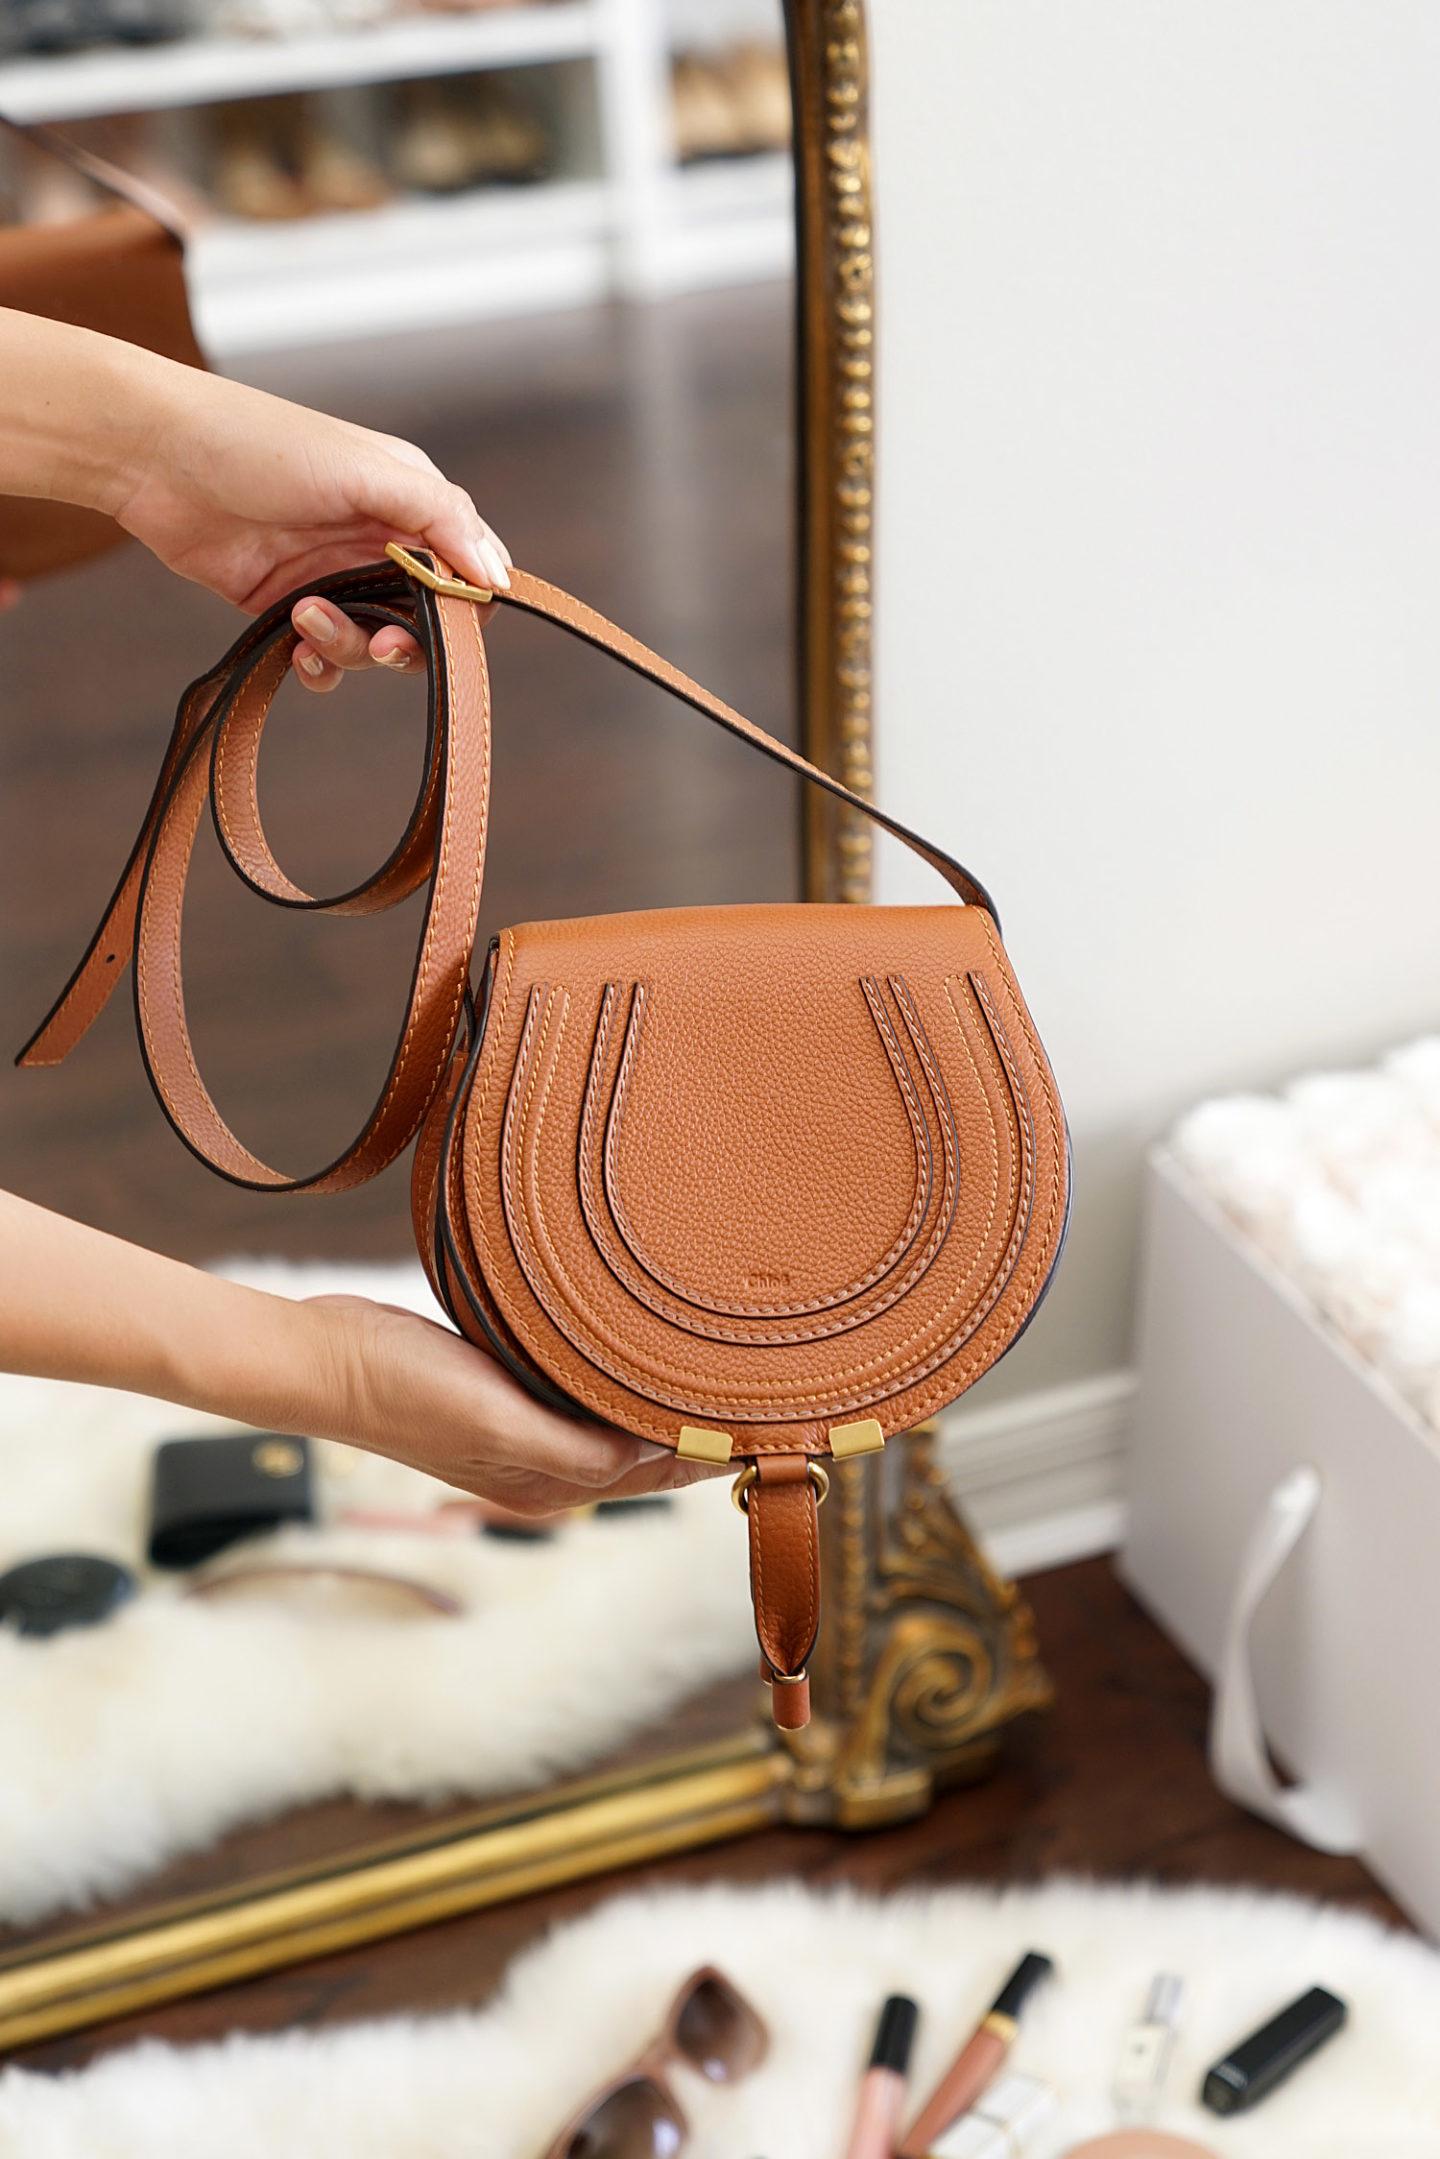 Chloe Mini Marcie Bag Assessment – Blushery